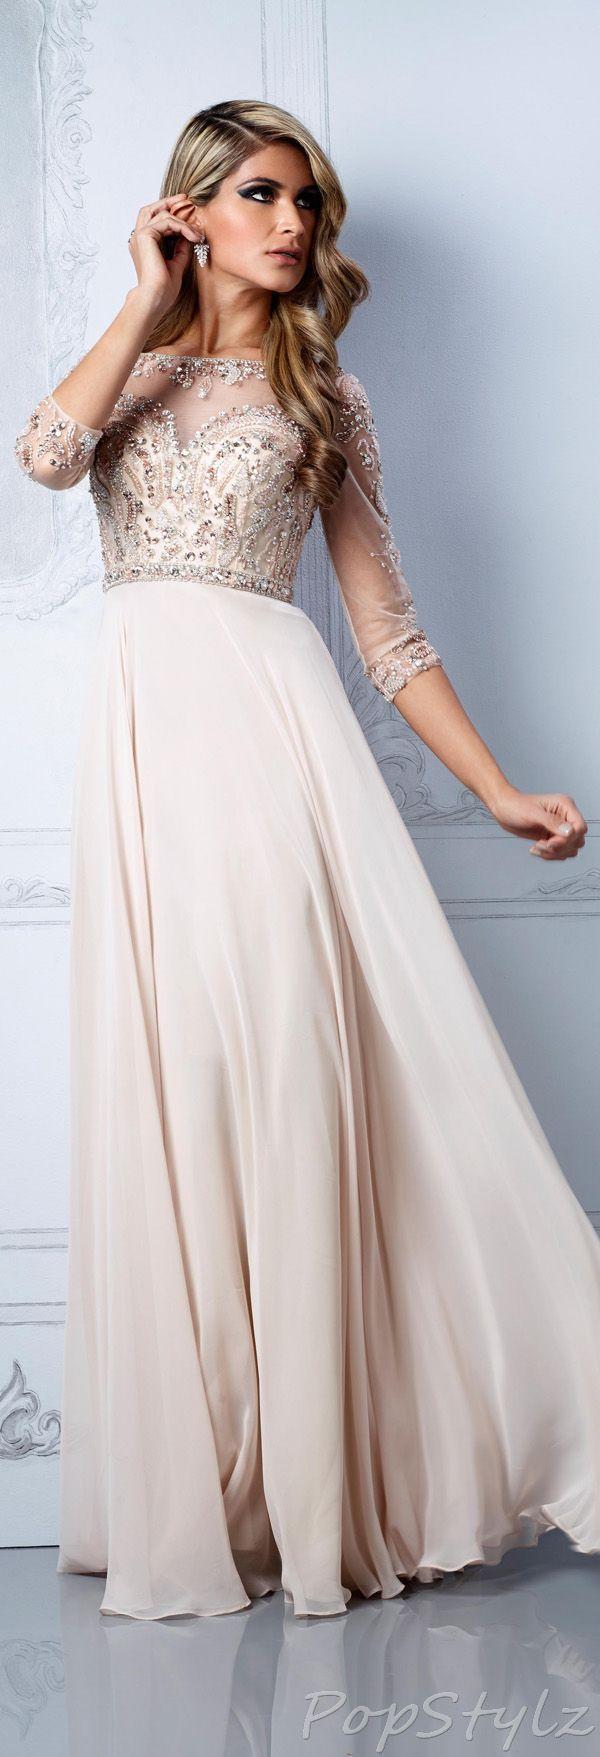 Beautiful romantic modest dress for a simple elegant wedding sheer